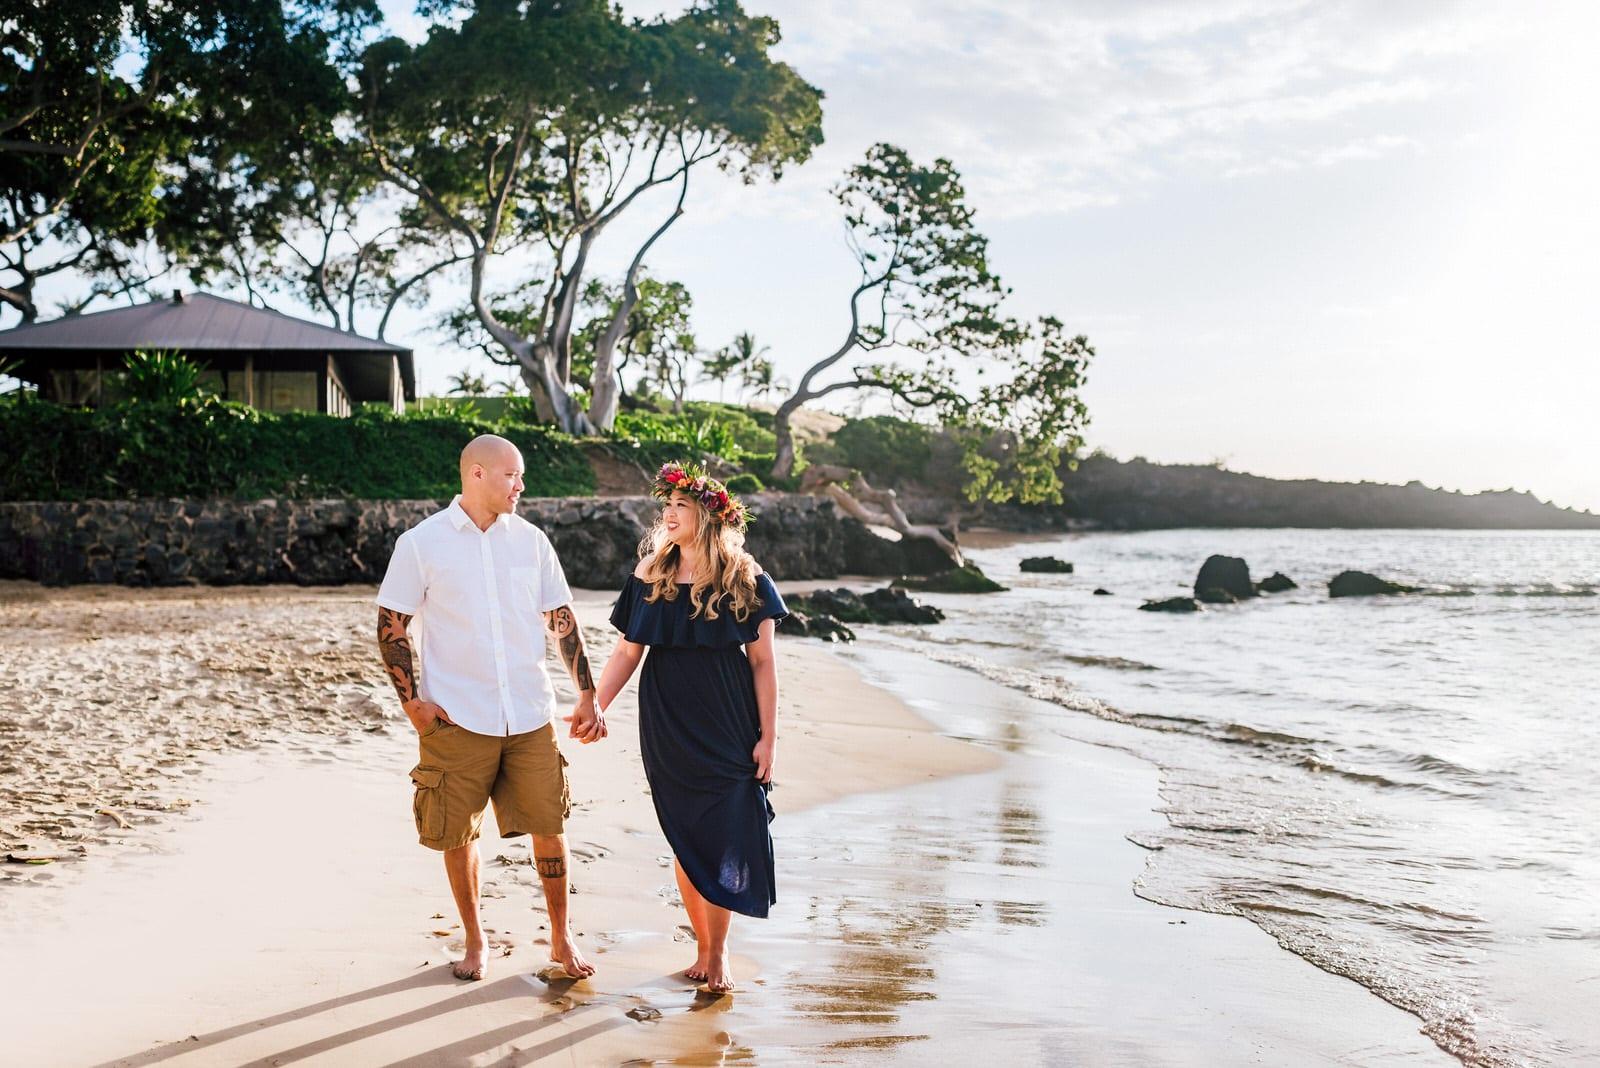 Family-Photographer-Mauna-Kea-Hotel-Large-Family-Colorful-Sunset-5.jpg